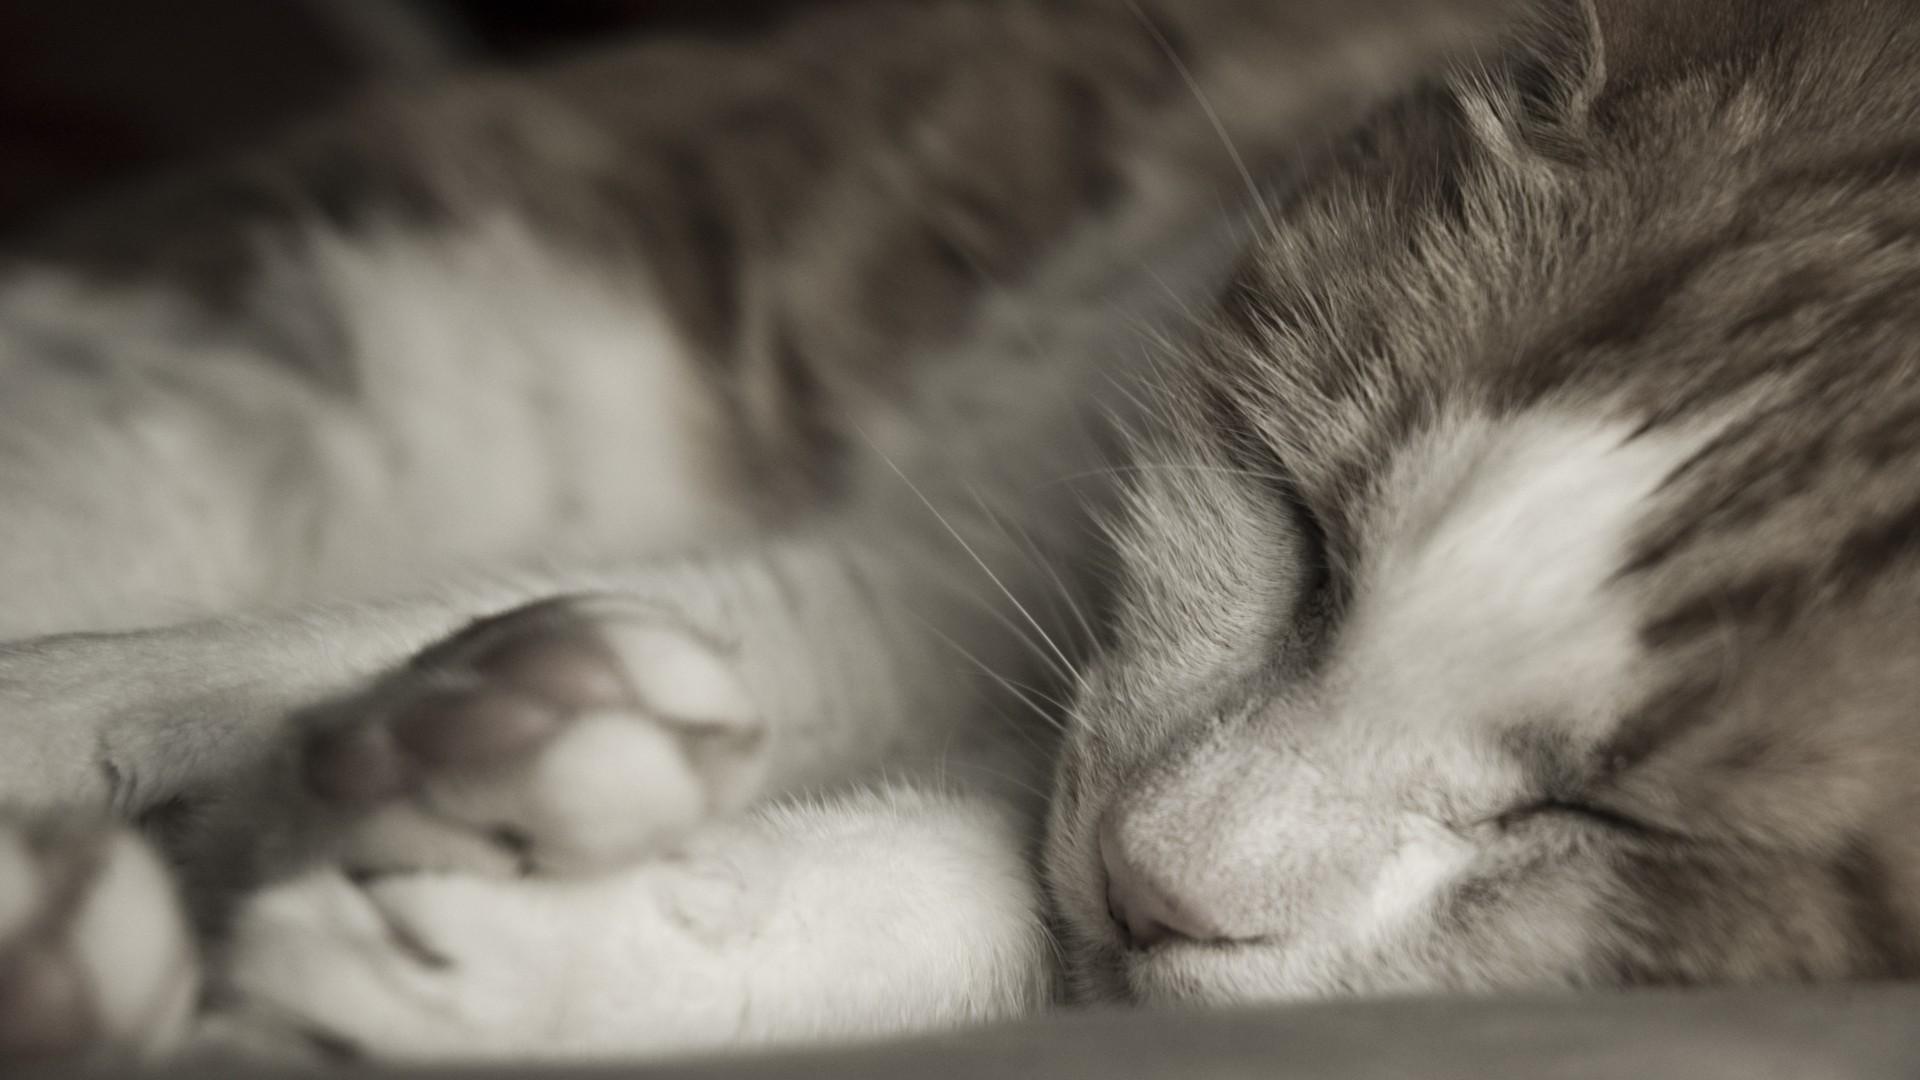 Sleeping Cat Close Up Wallpaper